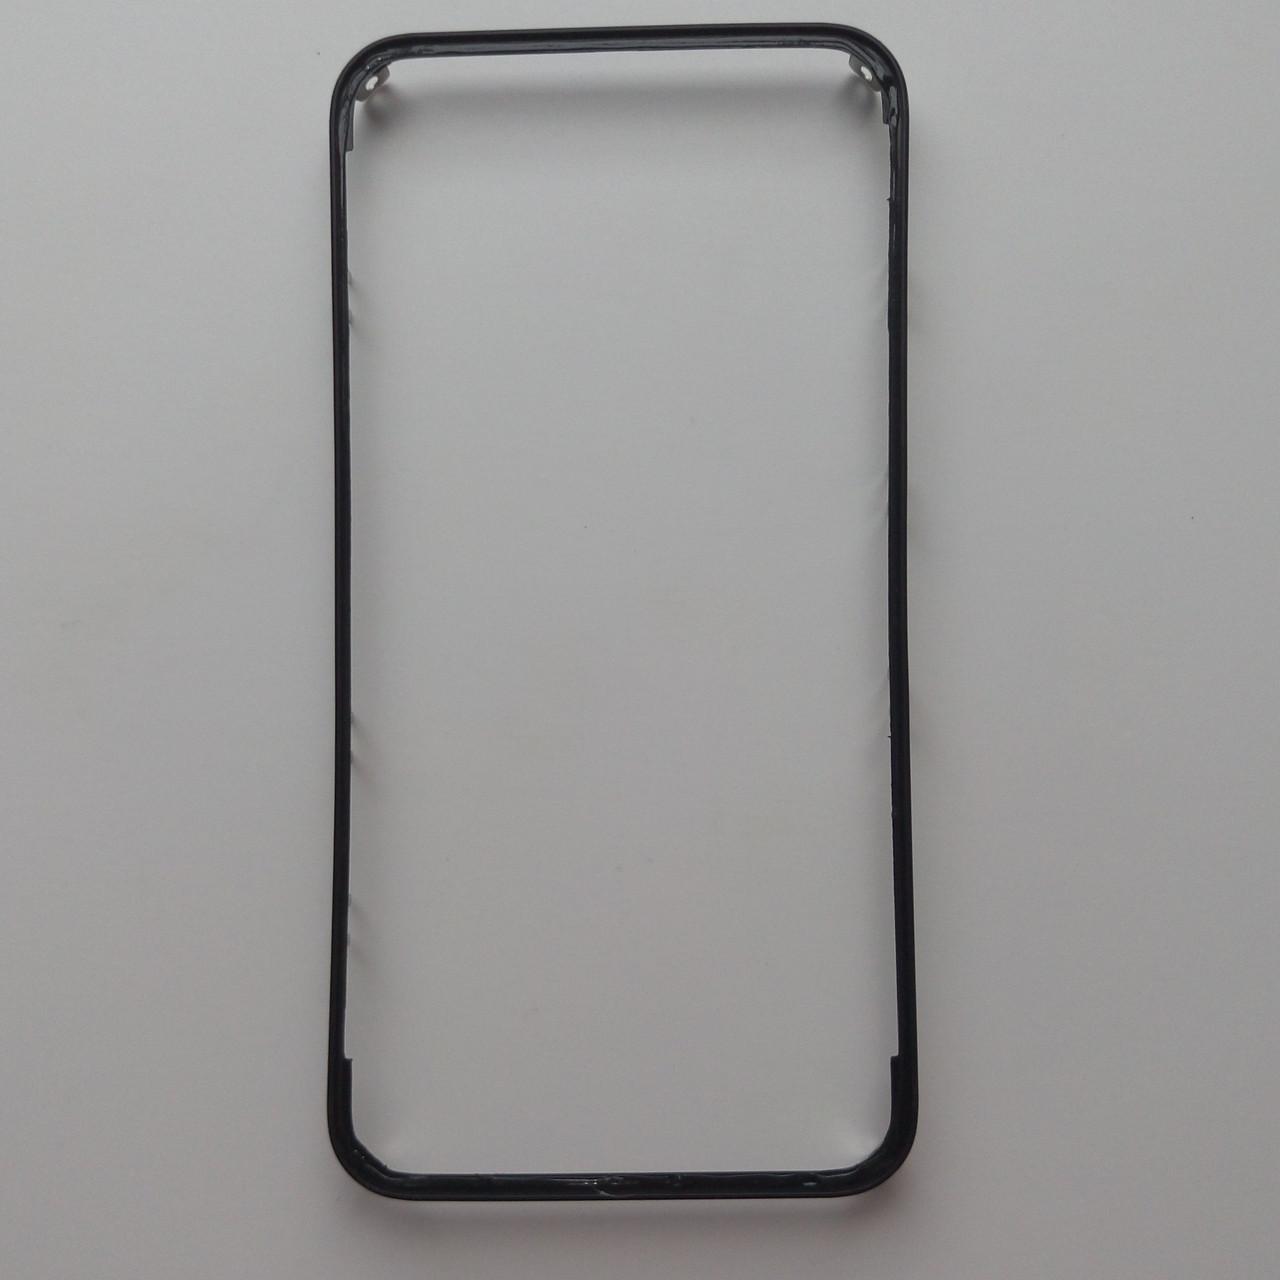 Рамка крепления дисплейного модуля Apple iPhone 4S Black